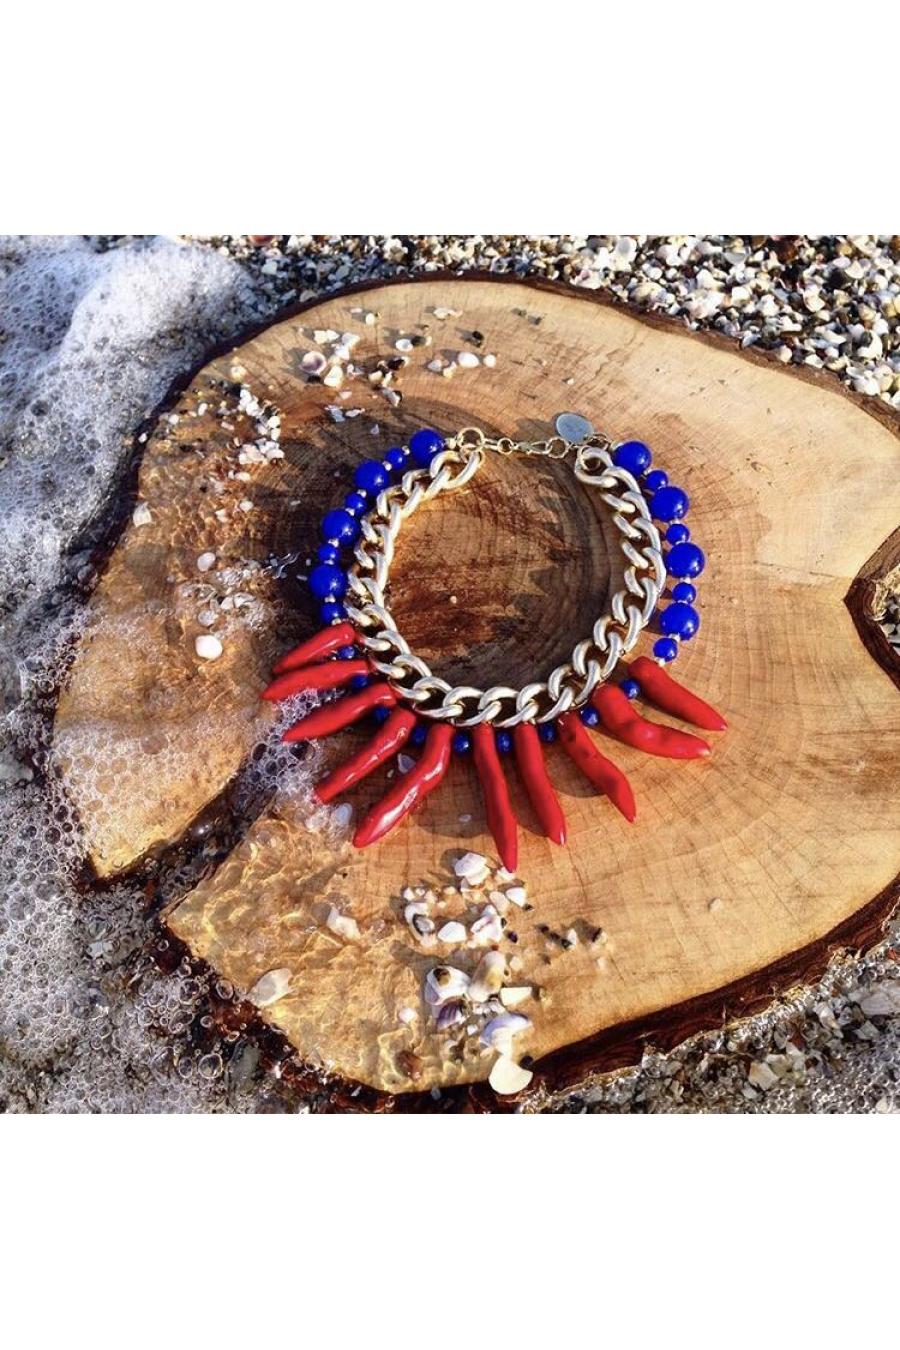 Ocean Coral Beads